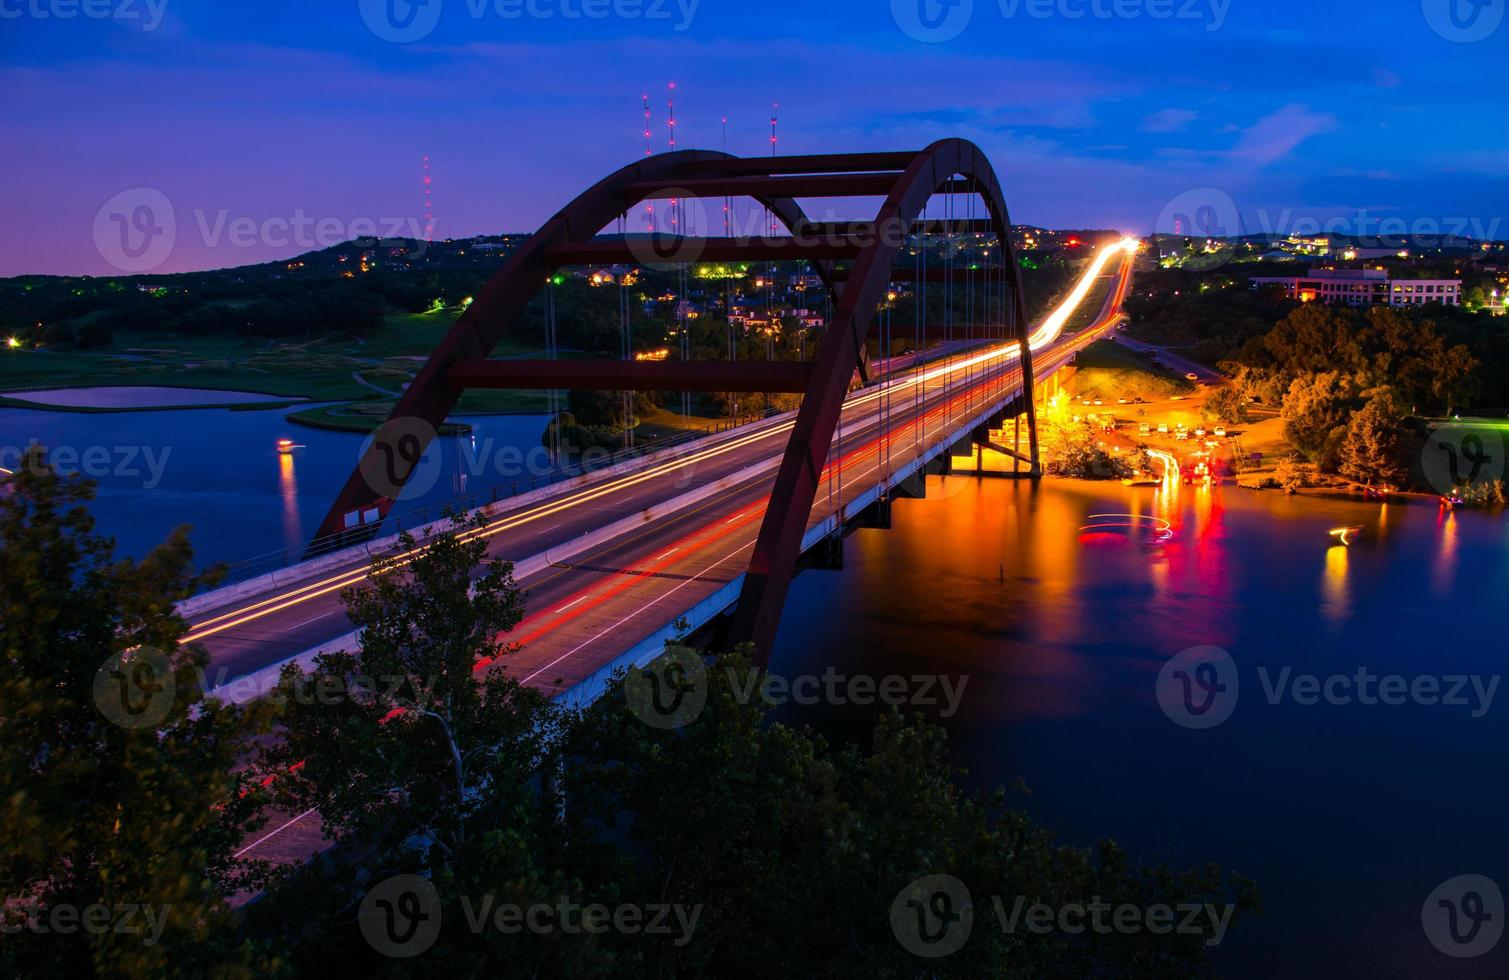 pennybacker loop 360 ponte noite tiro círculo luzes austin texas foto